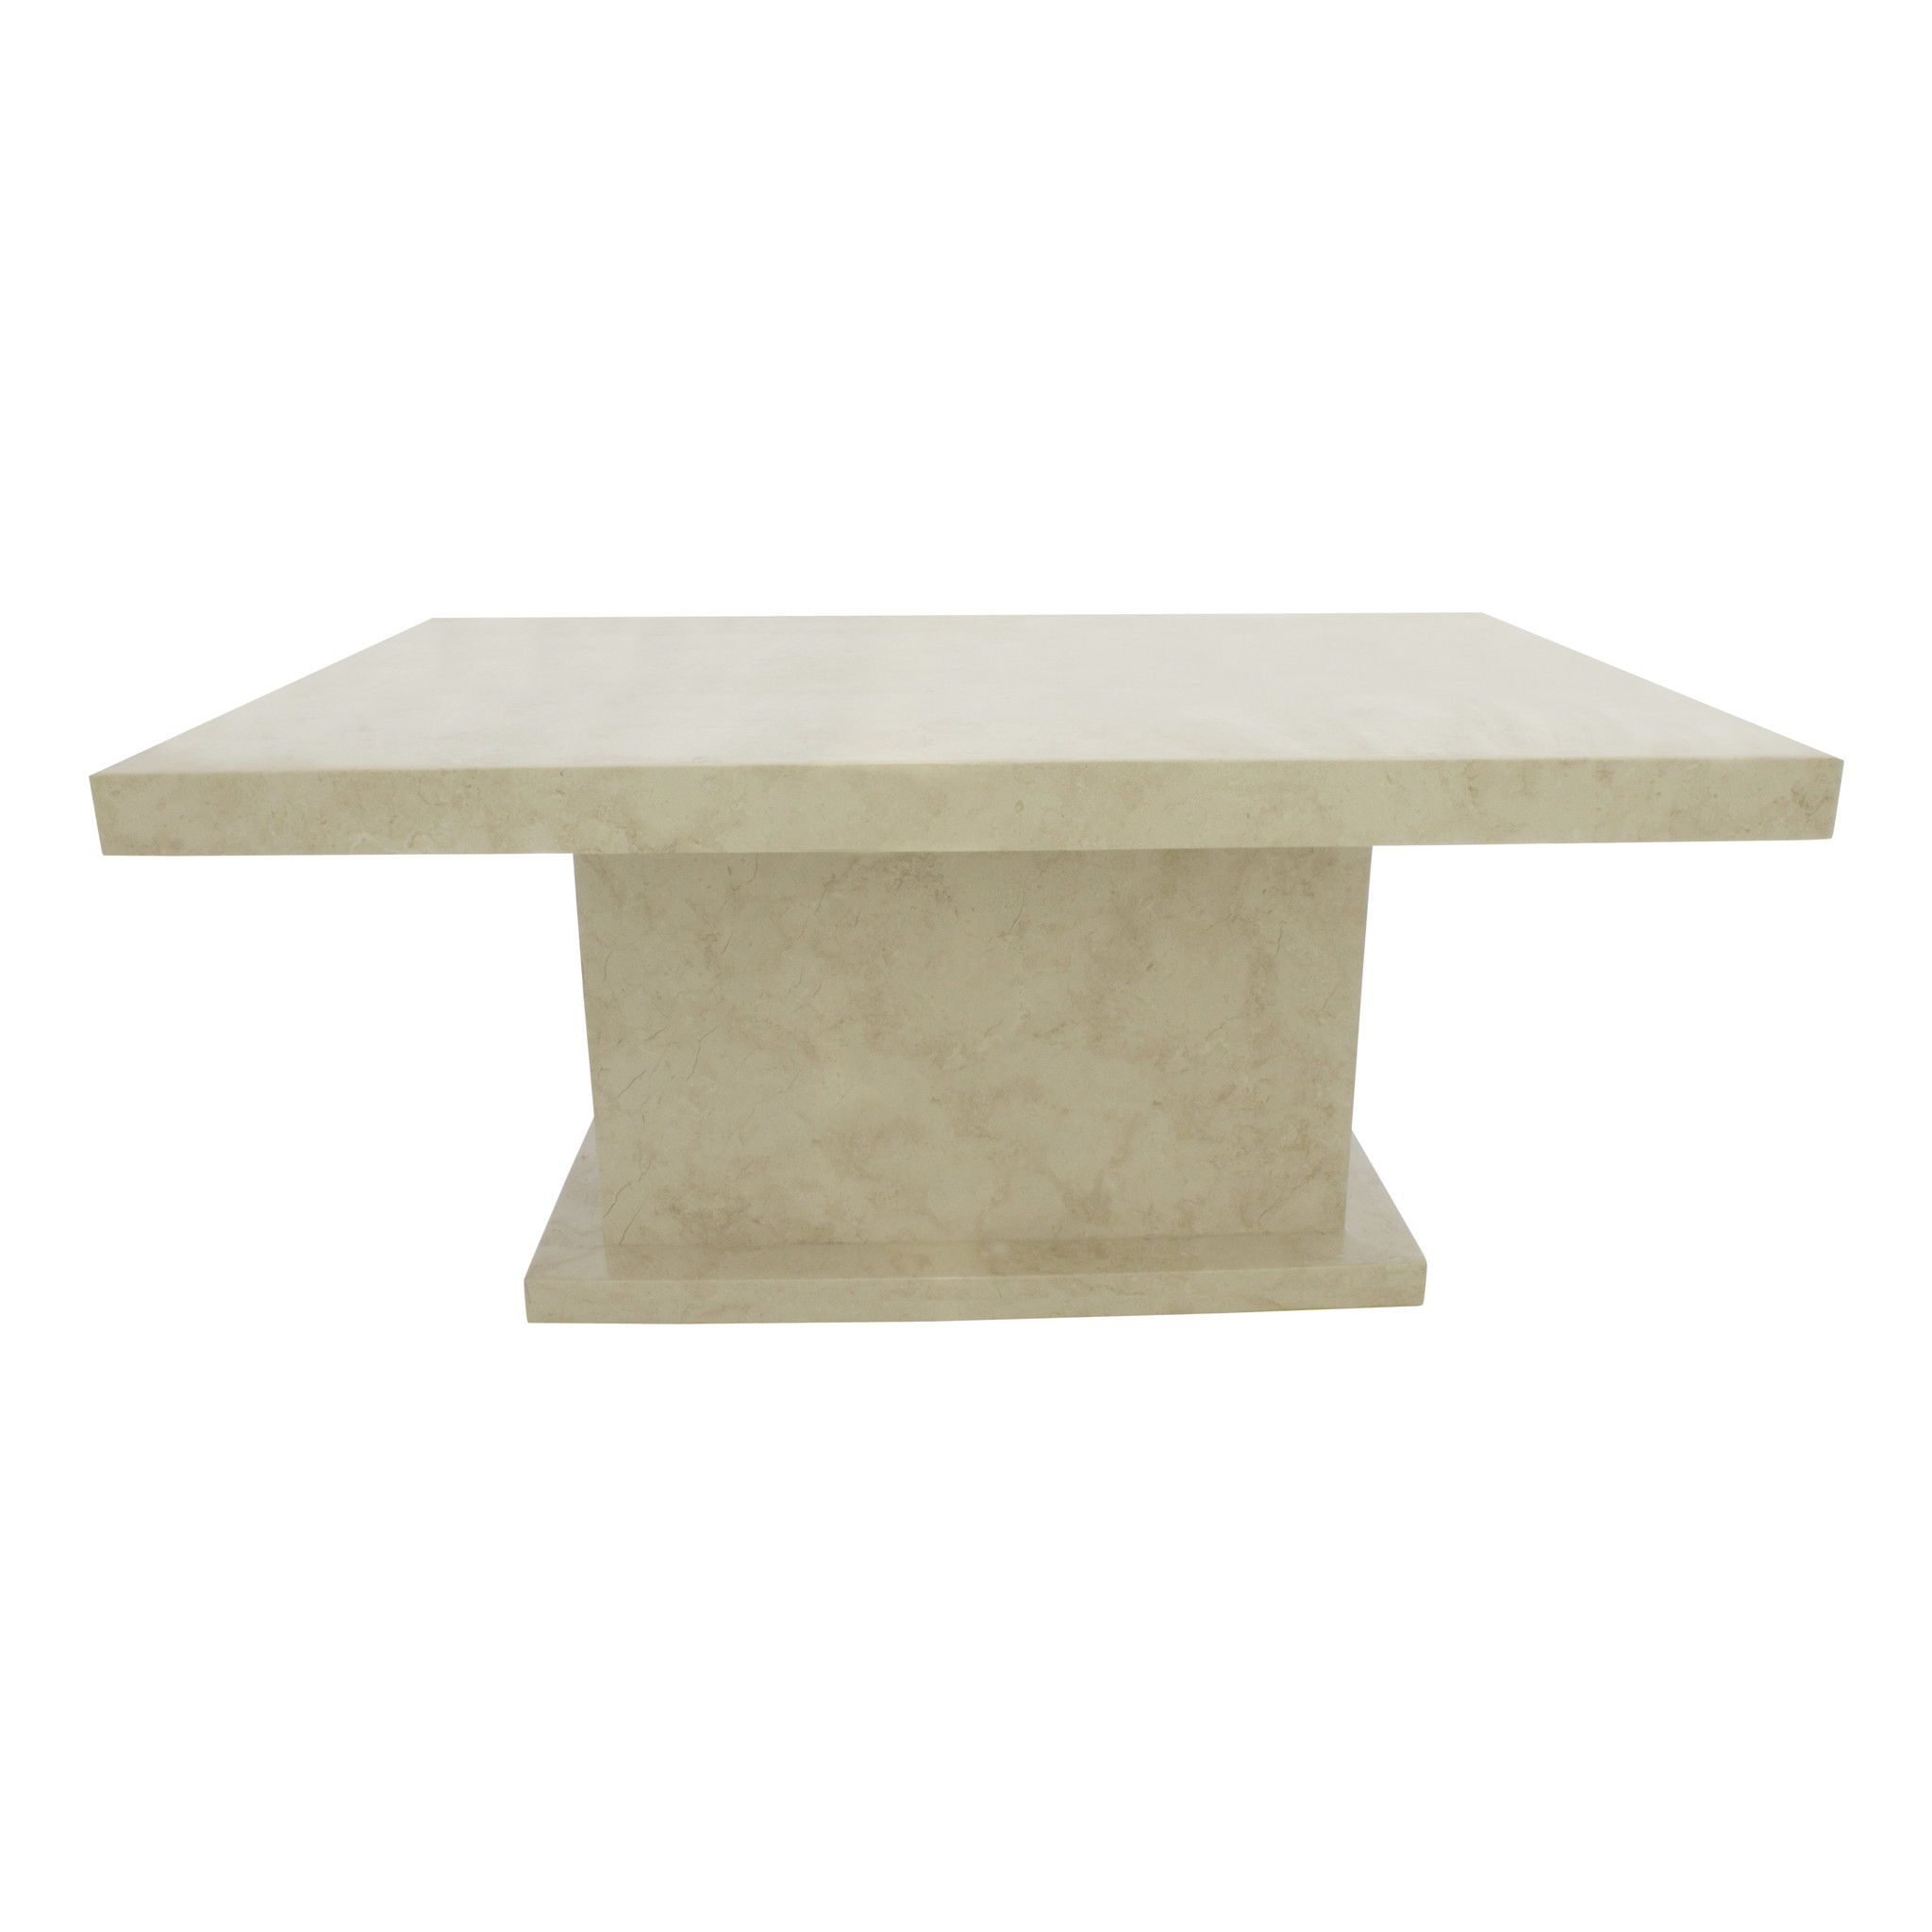 Indomarmer Marmeren salontafel 110x70x45 cm rechthoek crème